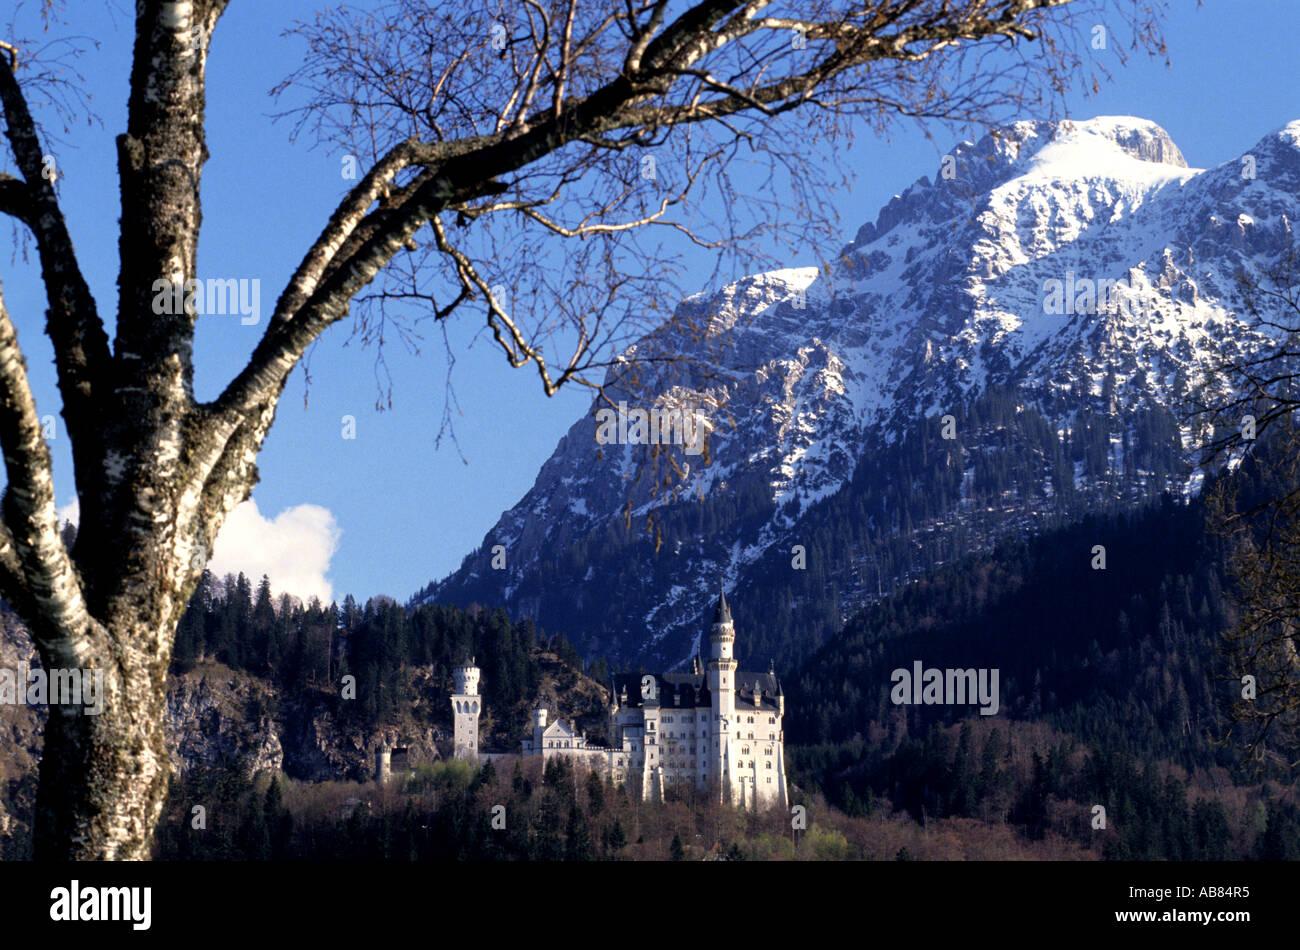 Bavaria, Bayern Neuschwanstein in Schwangau Oberbayern  1869 and 1886 Bavarian King Ludwig II. - Stock Image